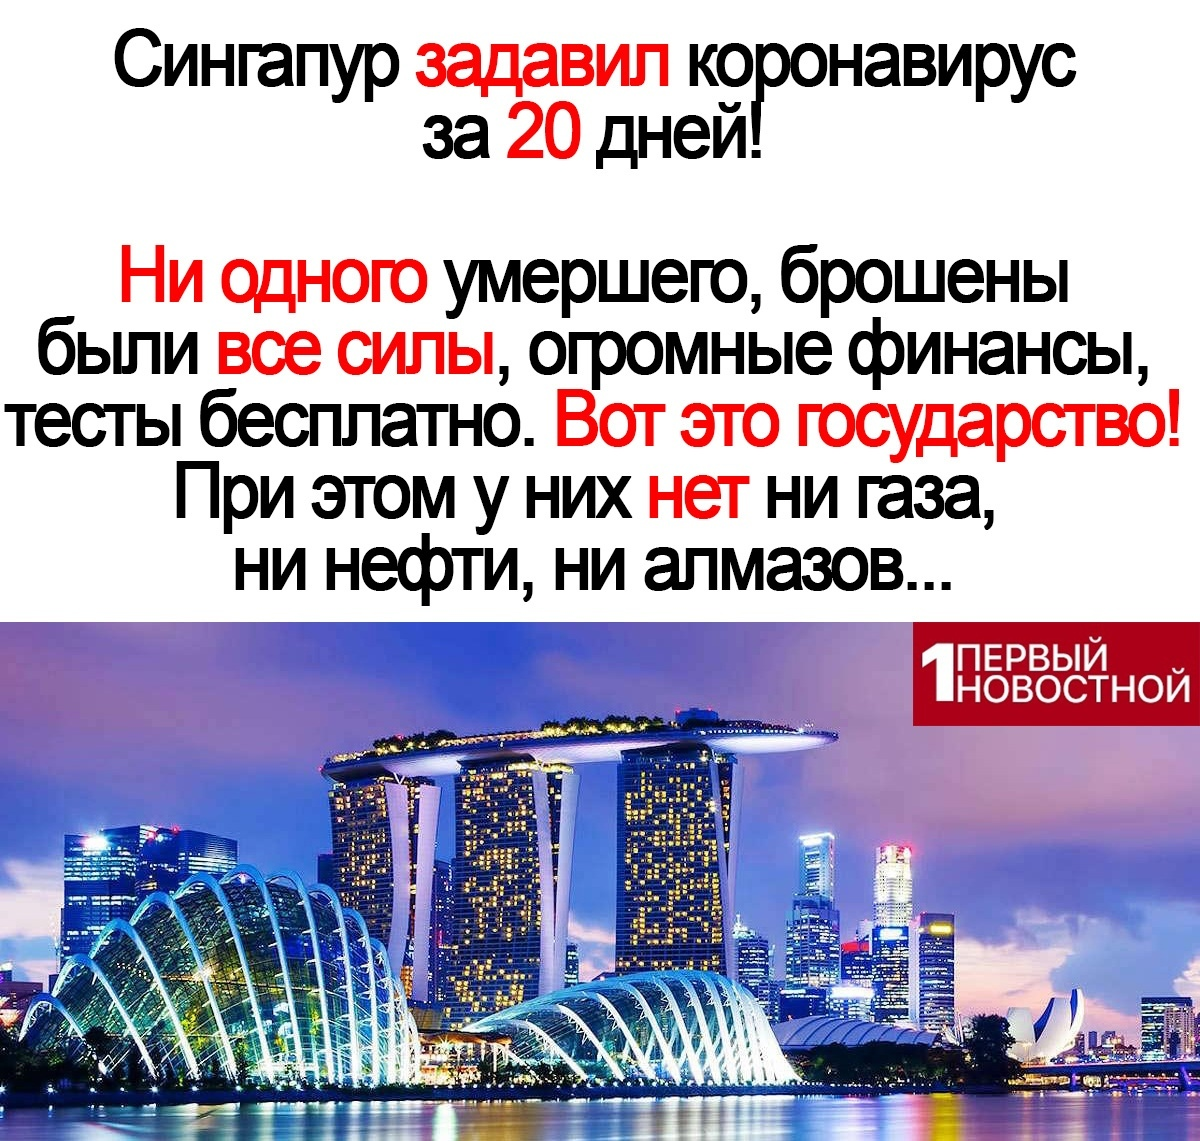 https://sun9-15.userapi.com/6Eny2NPoWq2X6KBDY2Cx8rk5drnJB9hV6SosMA/lZectvN4omU.jpg